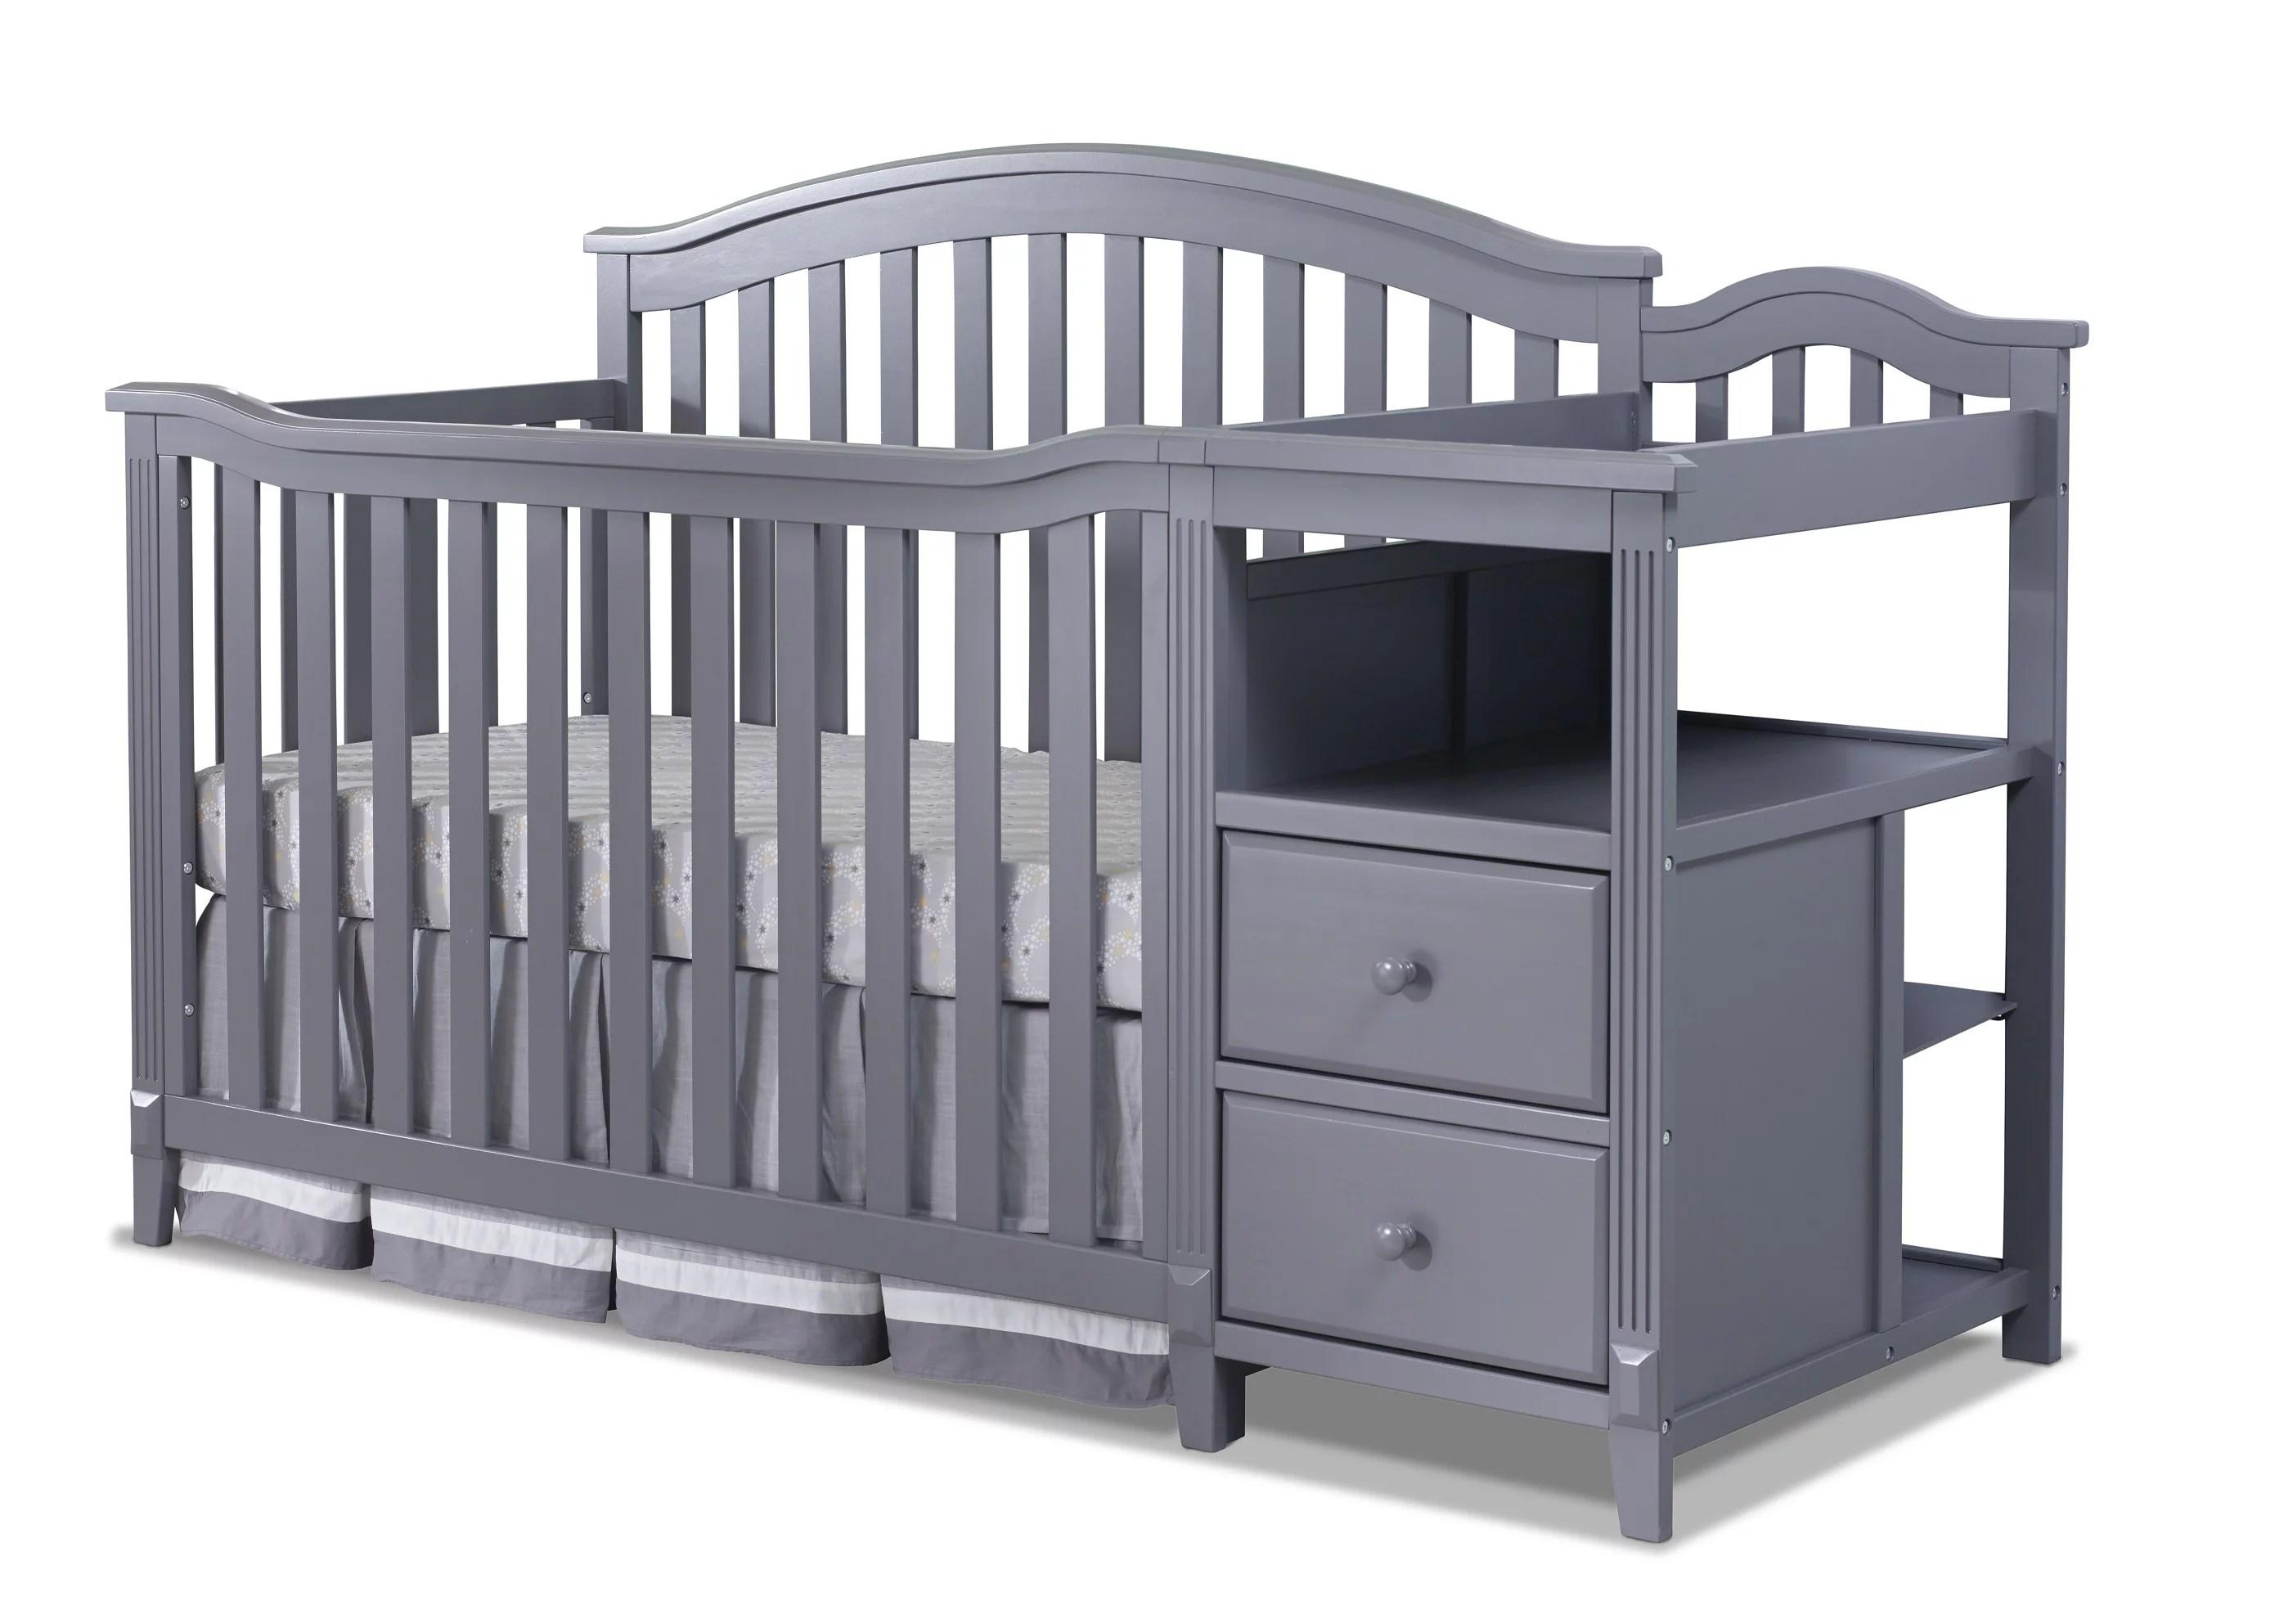 sorelle berkley 4 in 1 convertible crib and changer gray walmart com